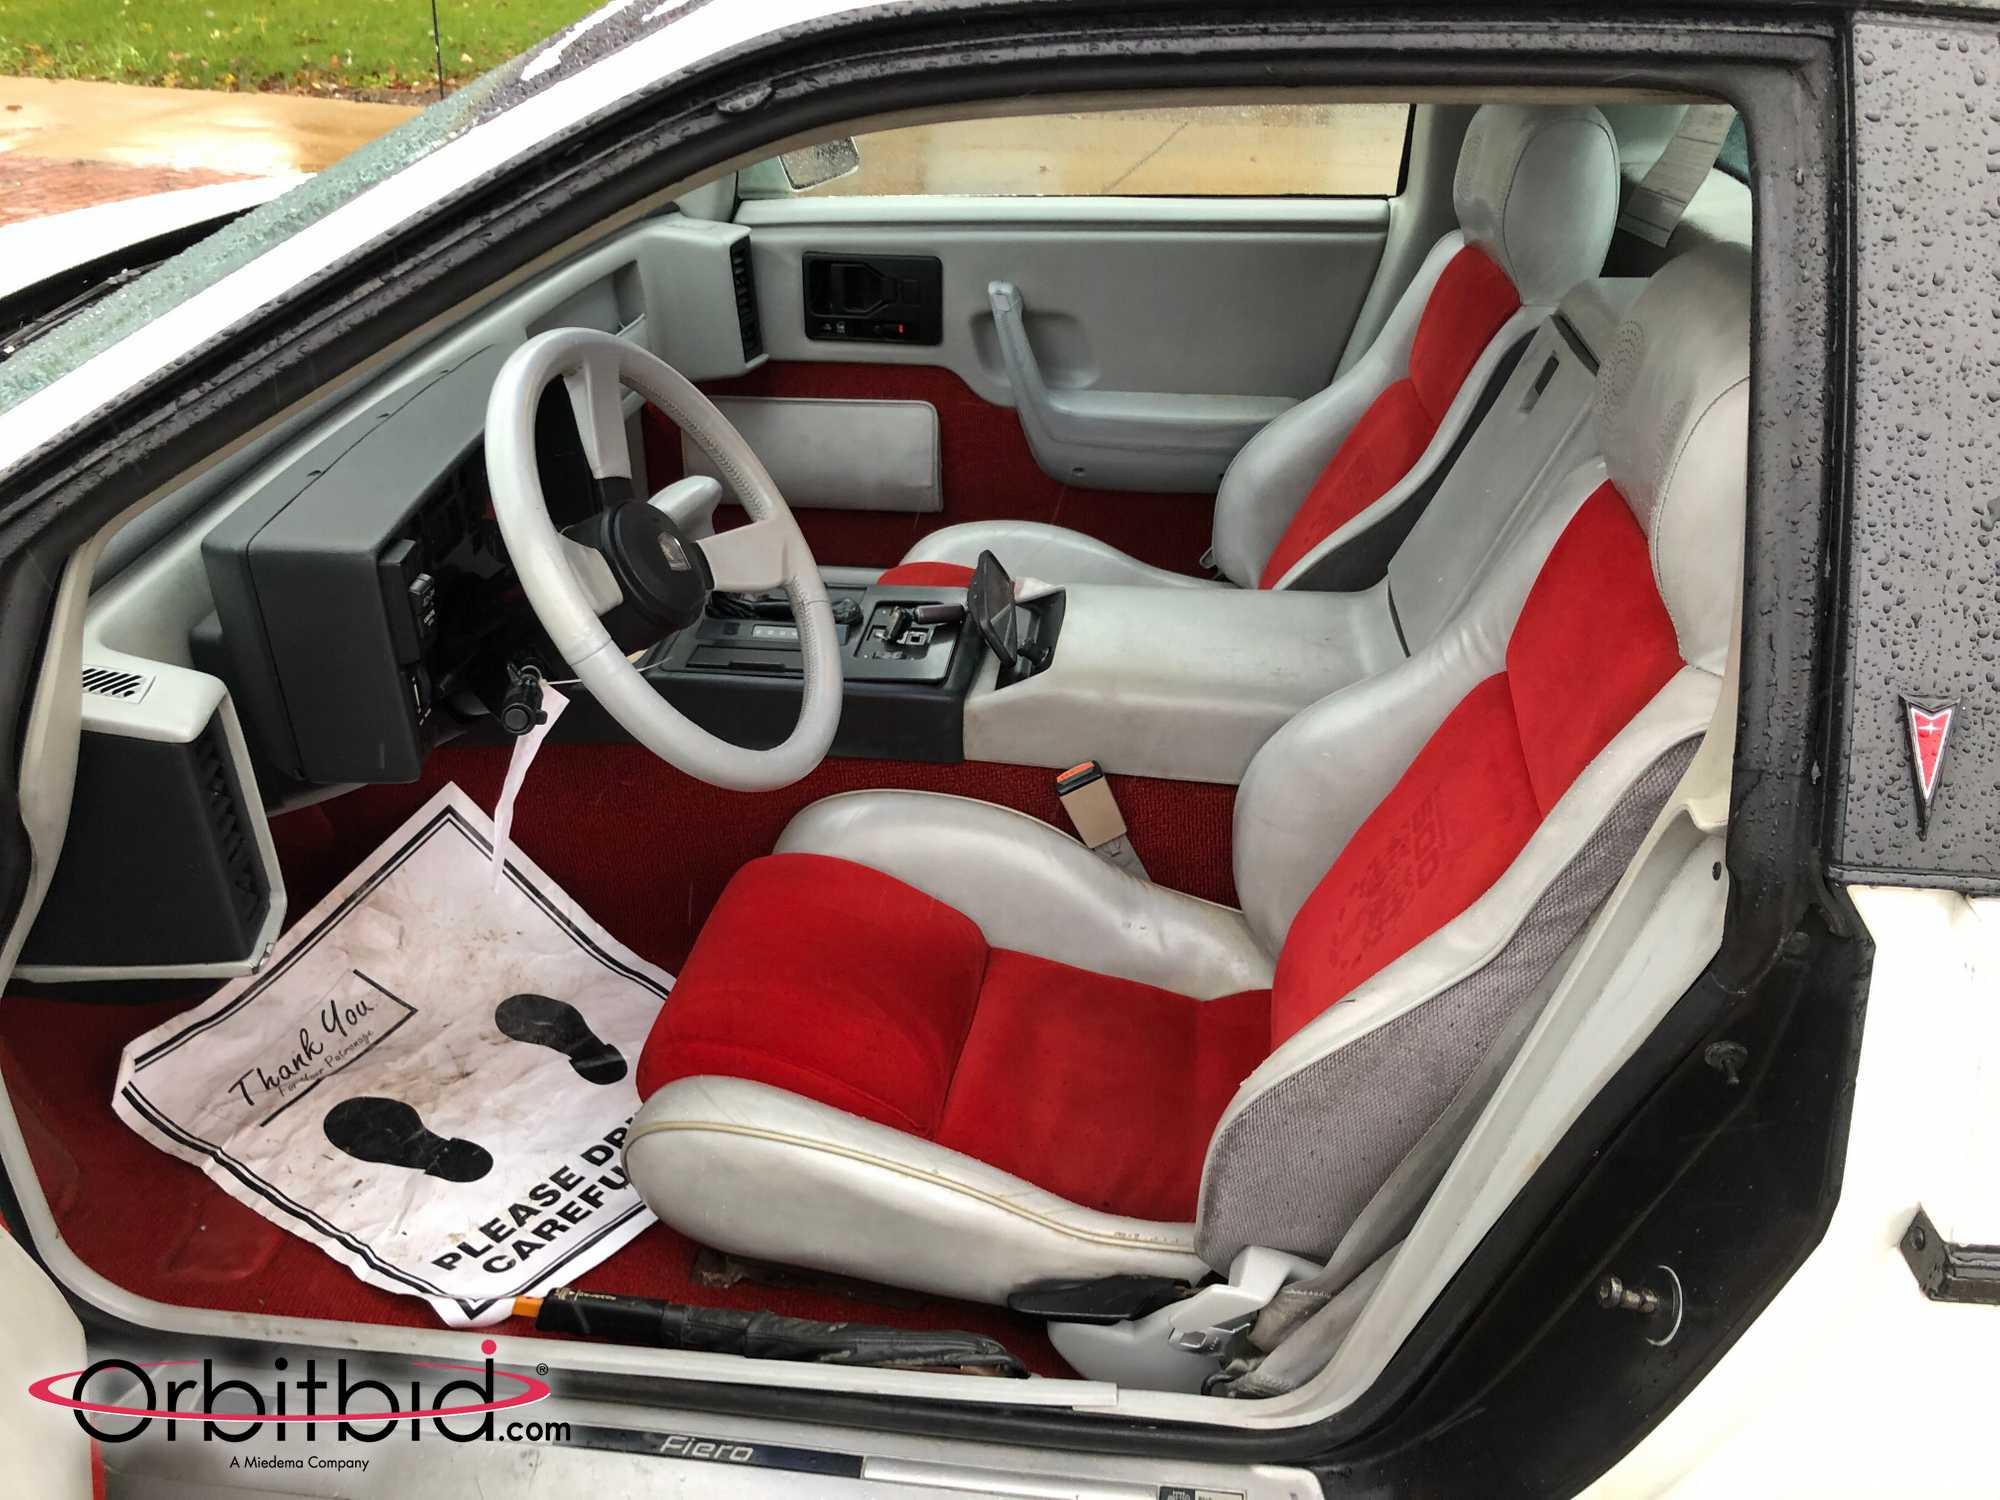 1984 Fiero Pace Car Interior